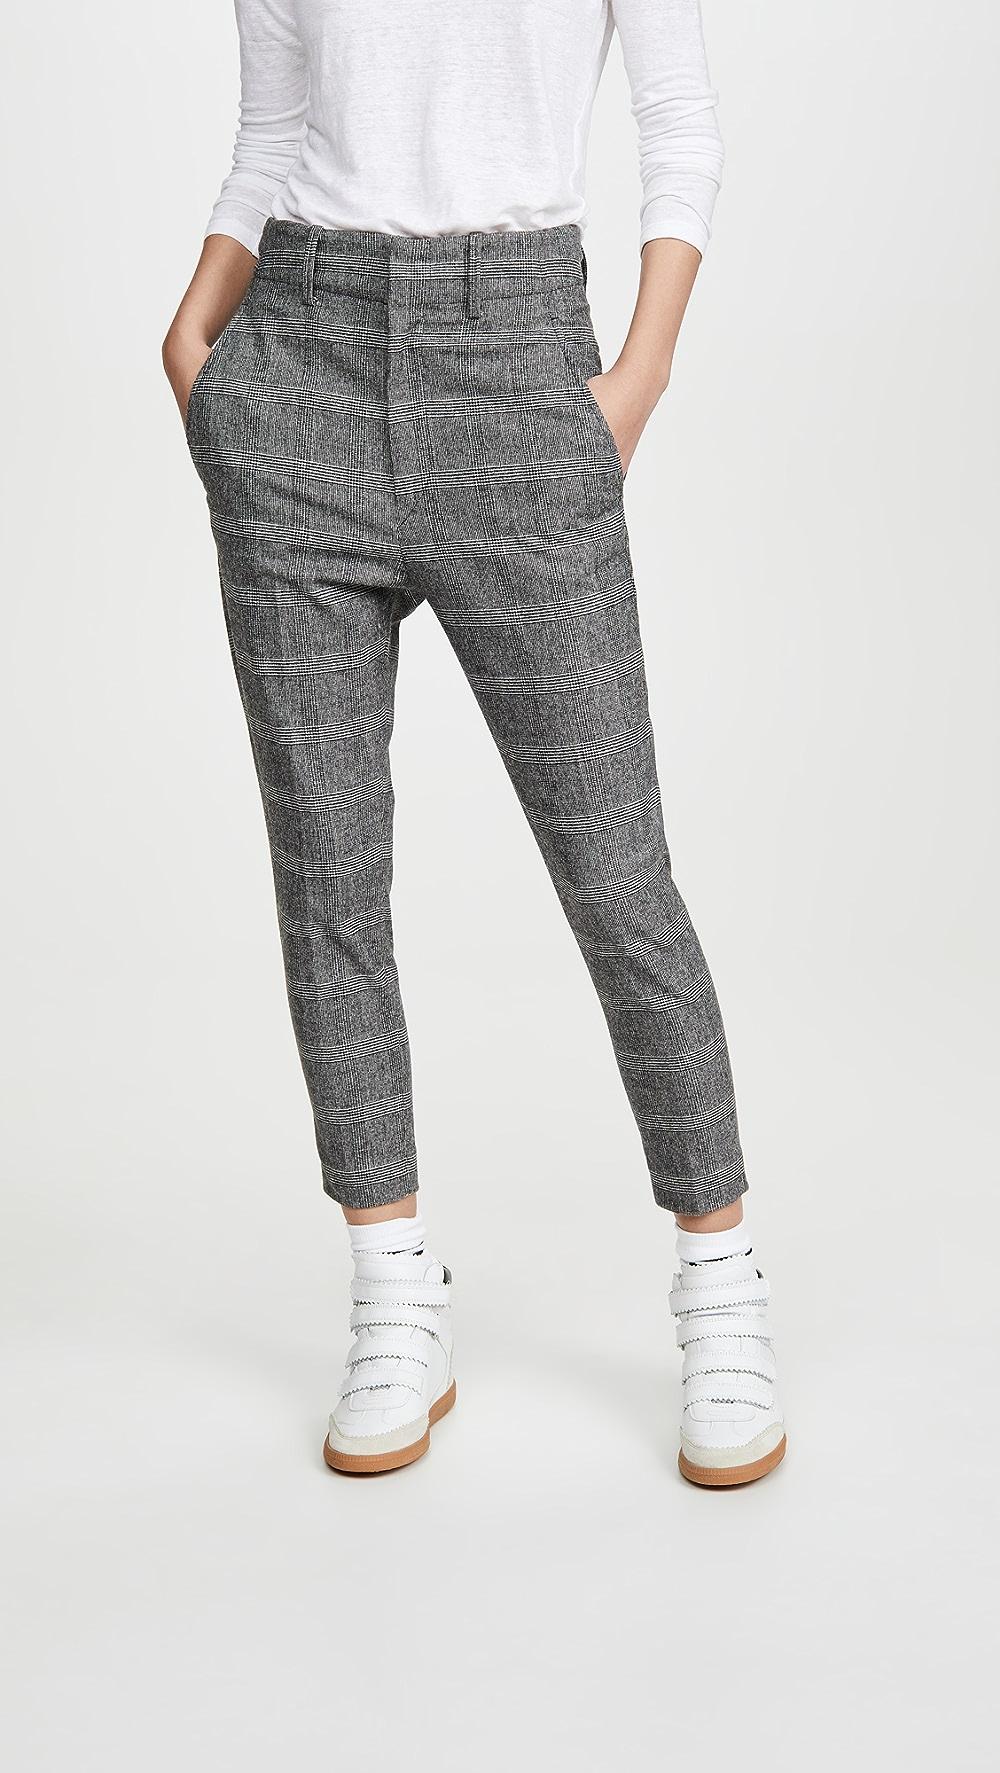 Conscientious Isabel Marant Etoile - Noah Trousers Durable Modeling